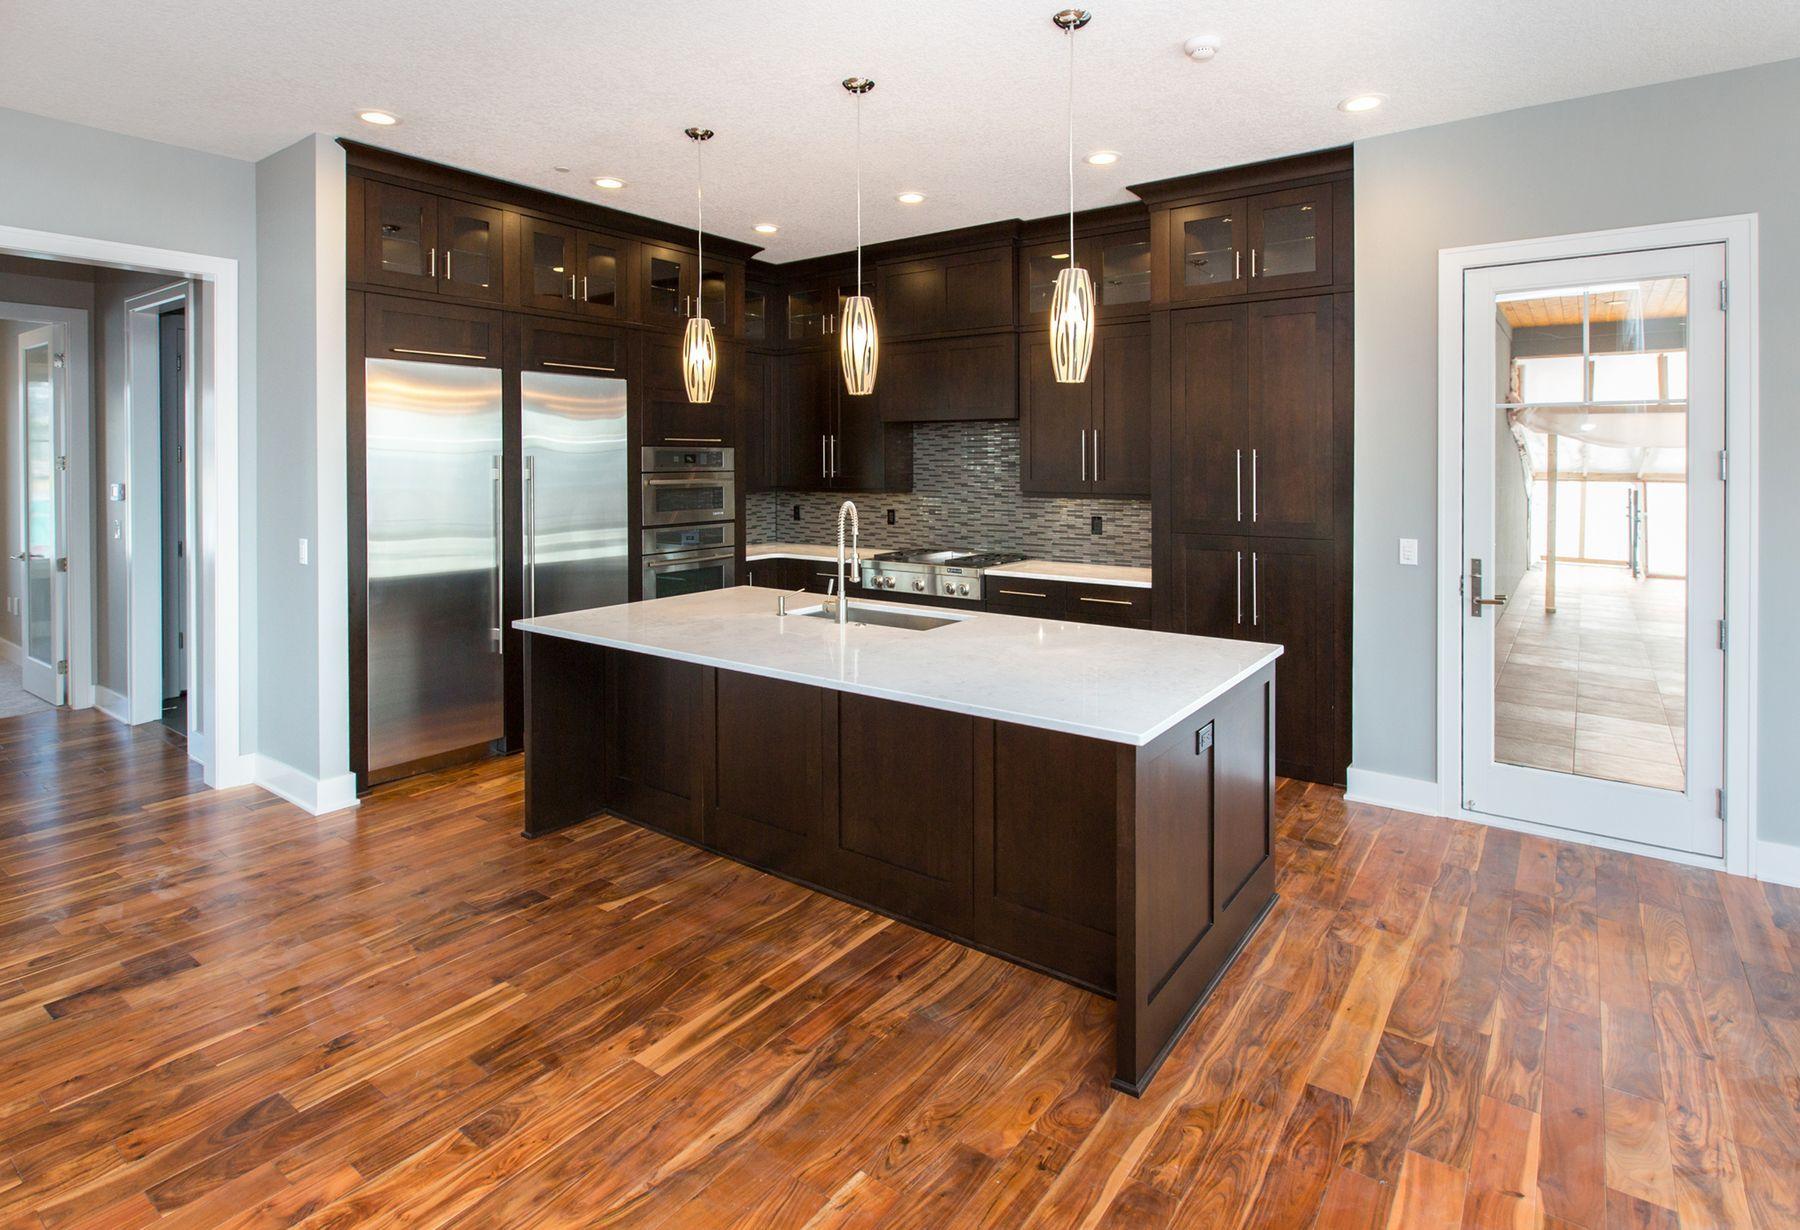 15 Stunning Minimalist Kitchen Design Ideas For Comfort While Cooking Dark Kitchen Minimalist Kitchen Cabinets Minimalist Kitchen Design